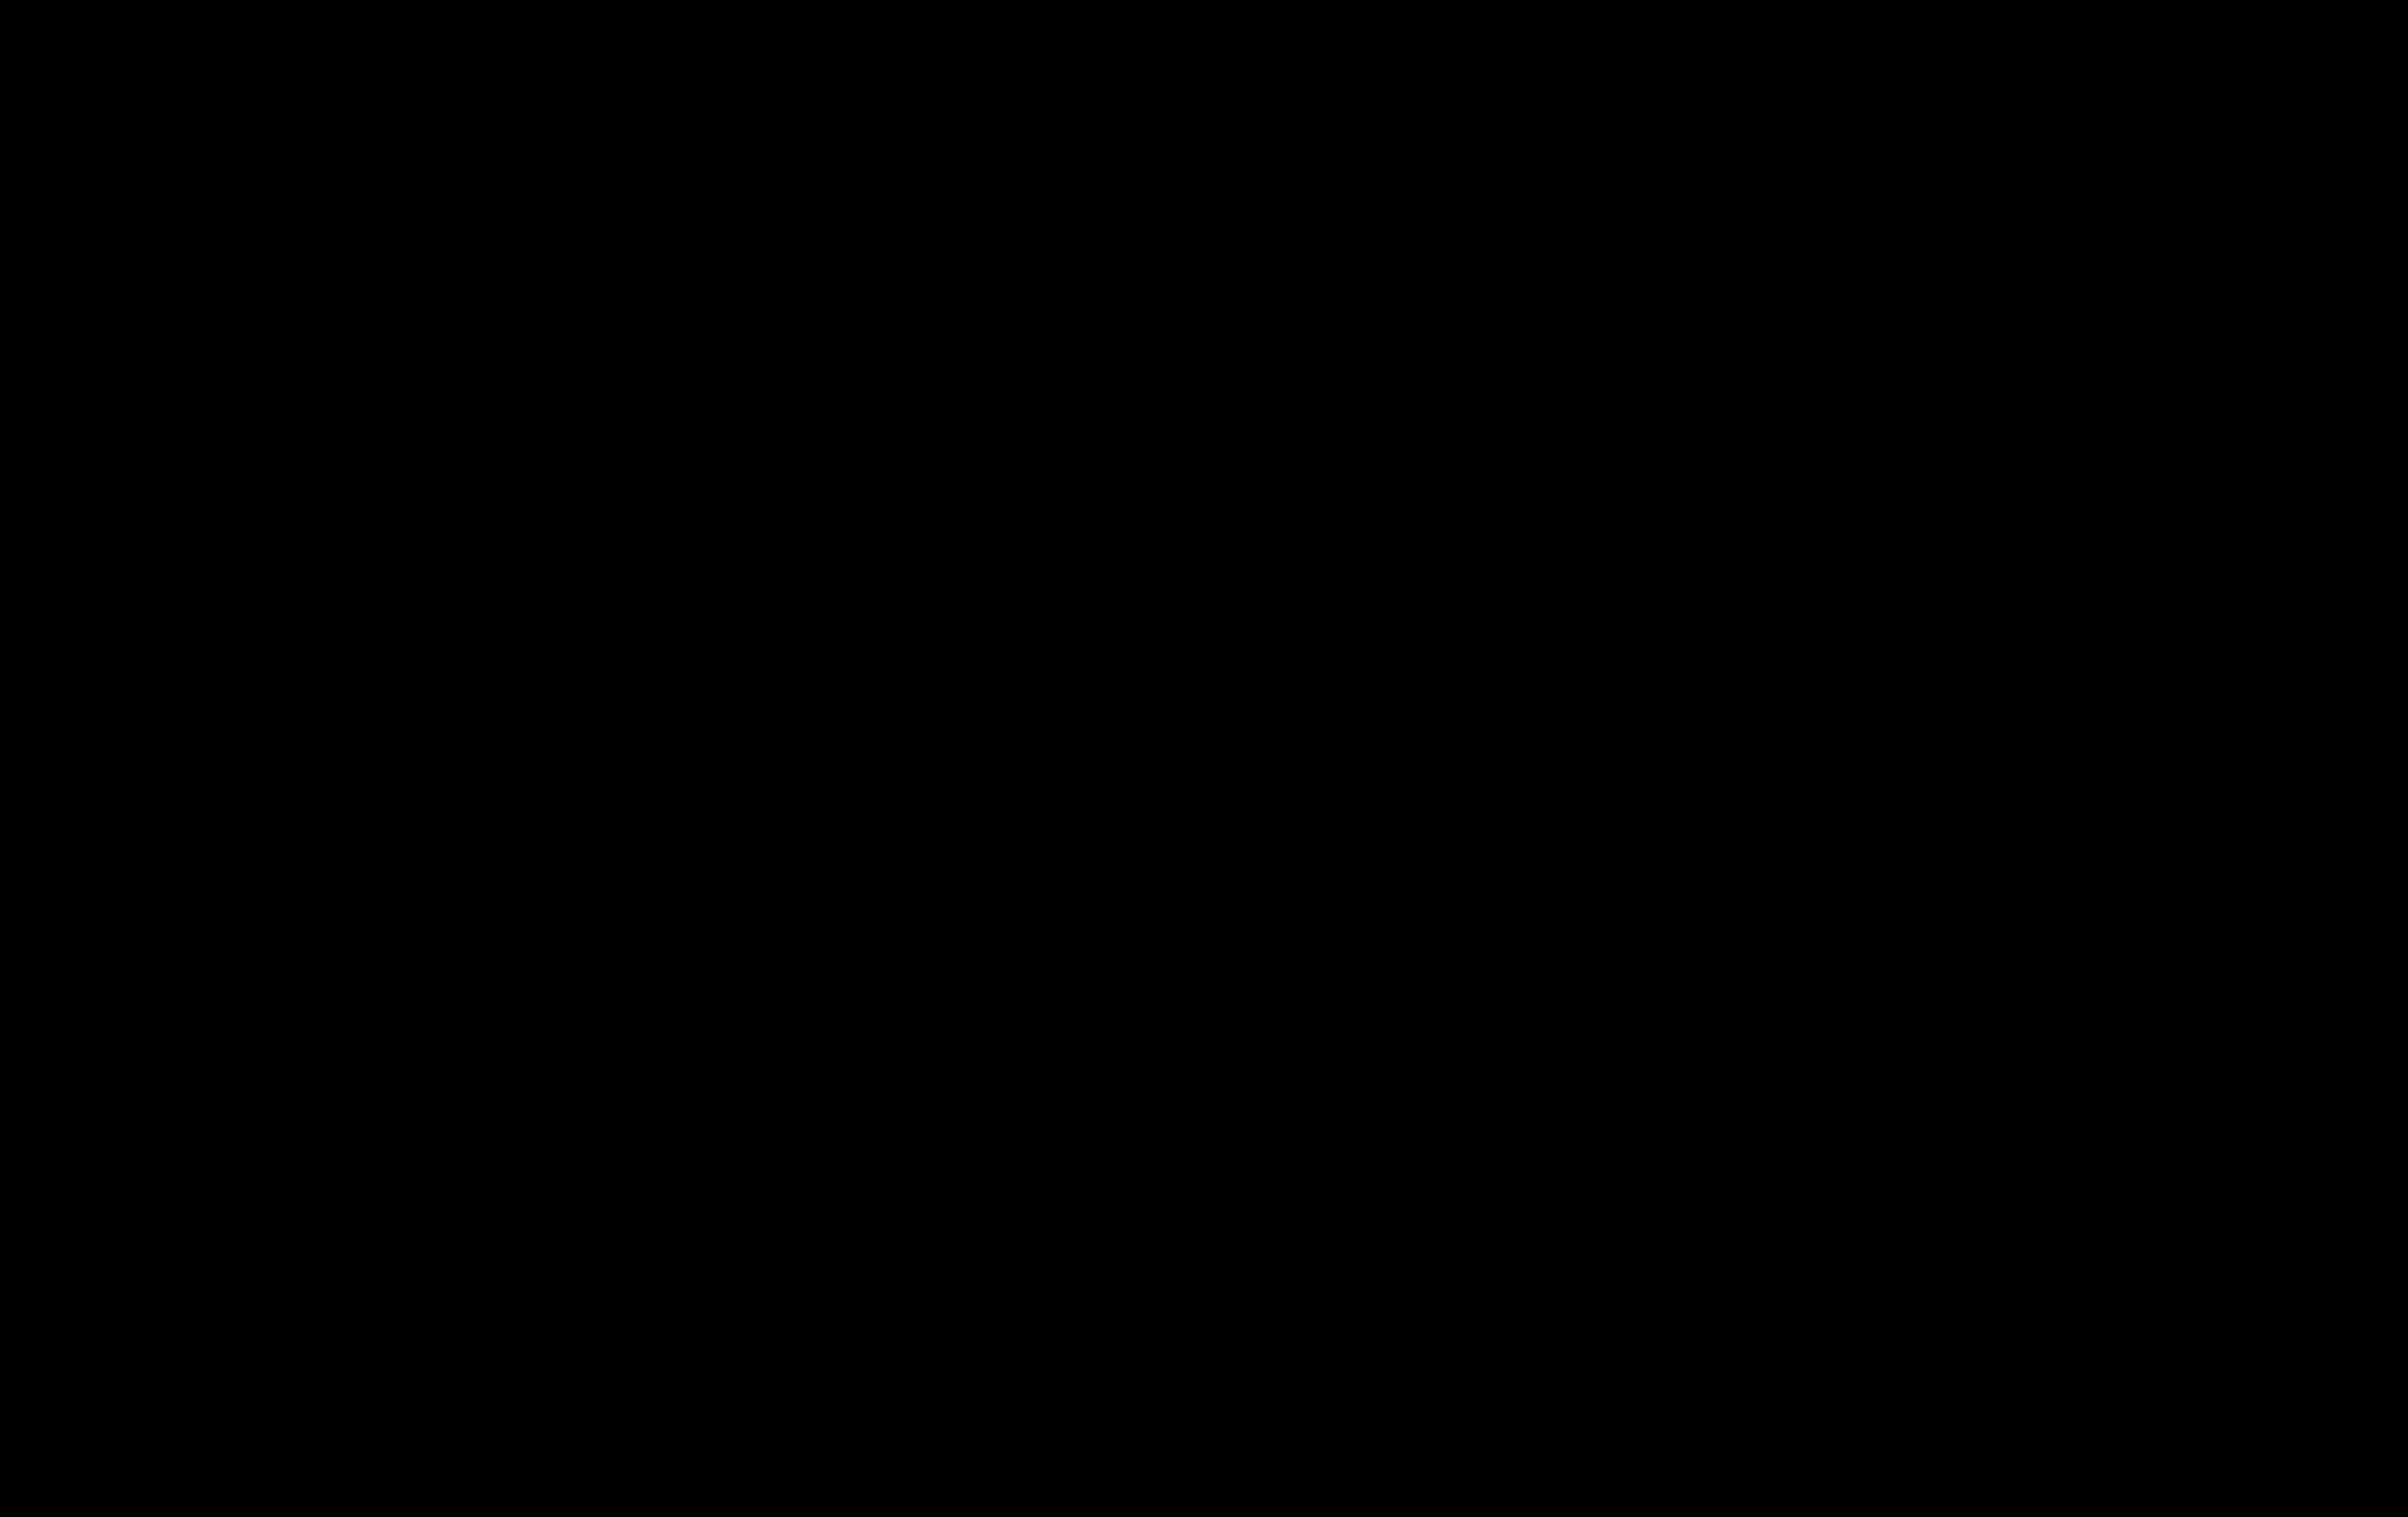 cartoon-crack-banner-3.png